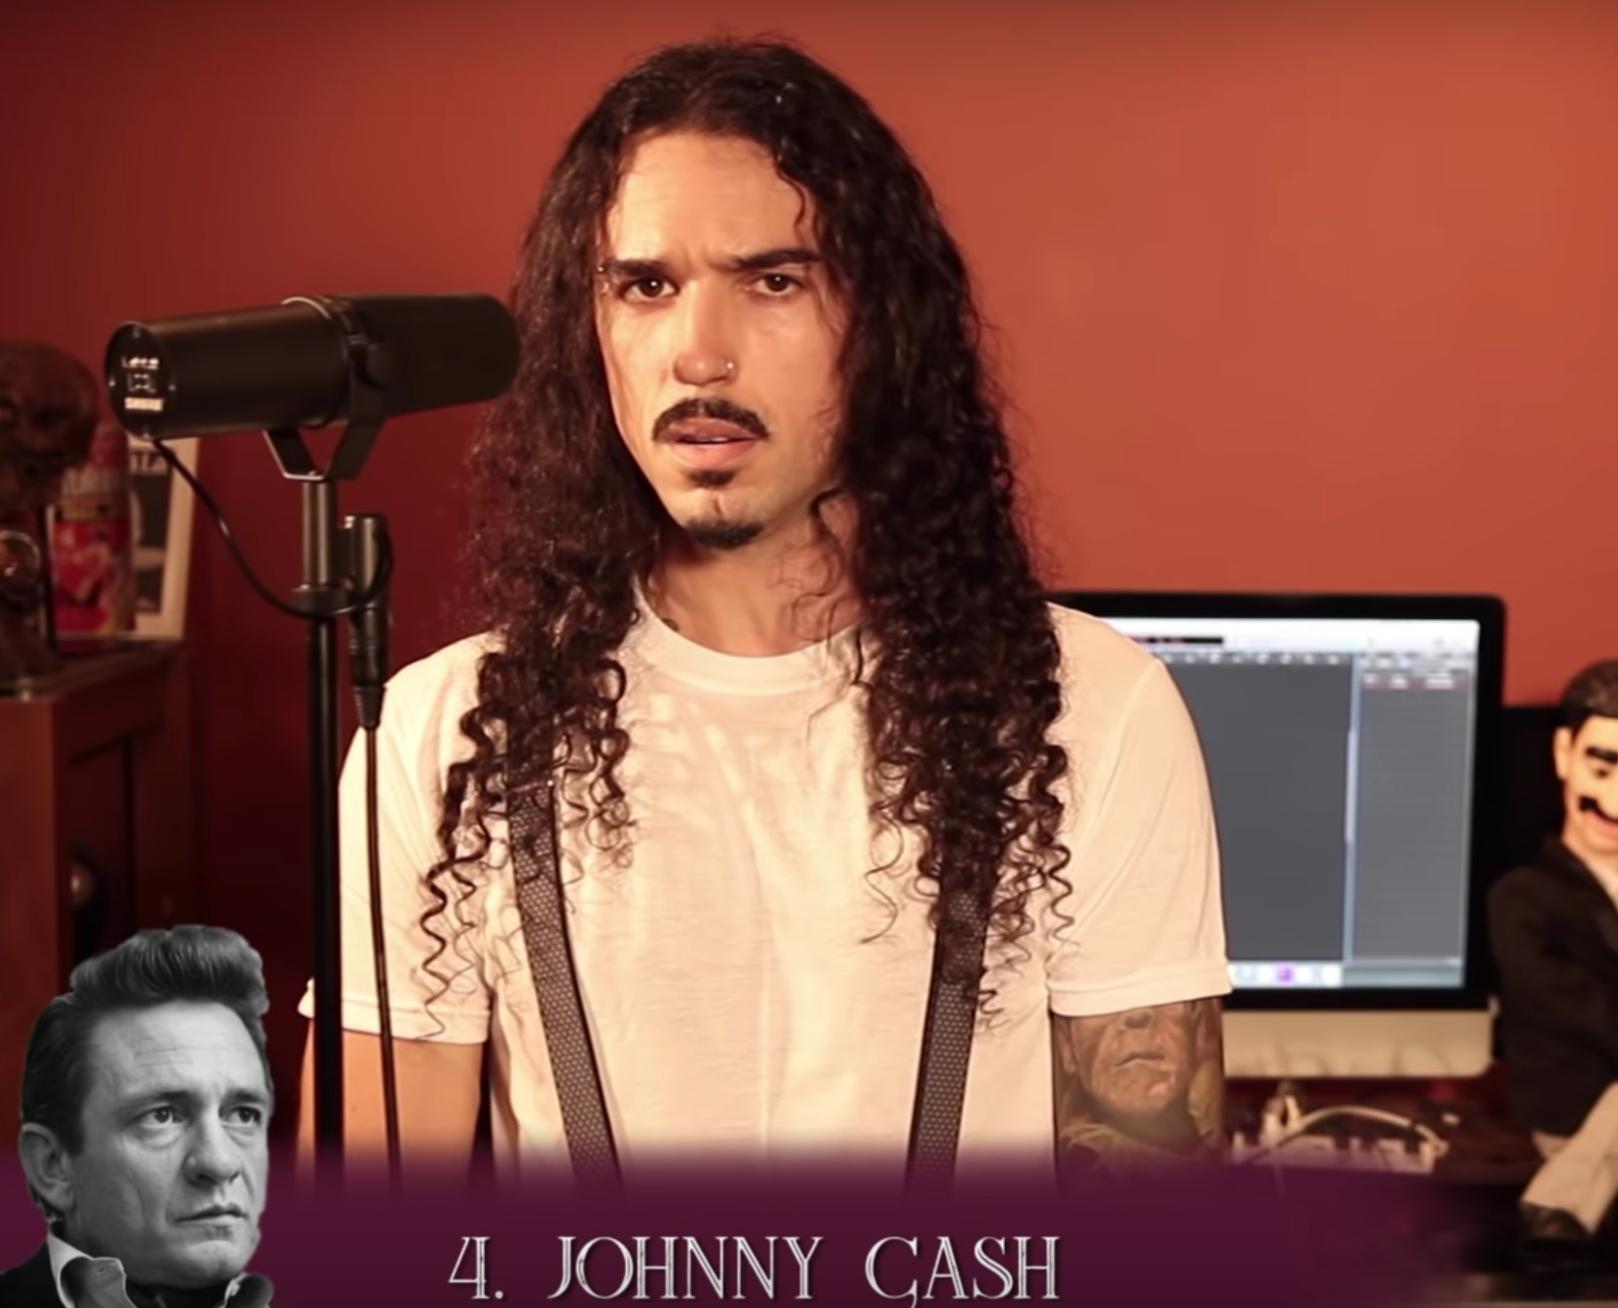 Escucha Bohemian Rhapsody en 42 diferentes estilos